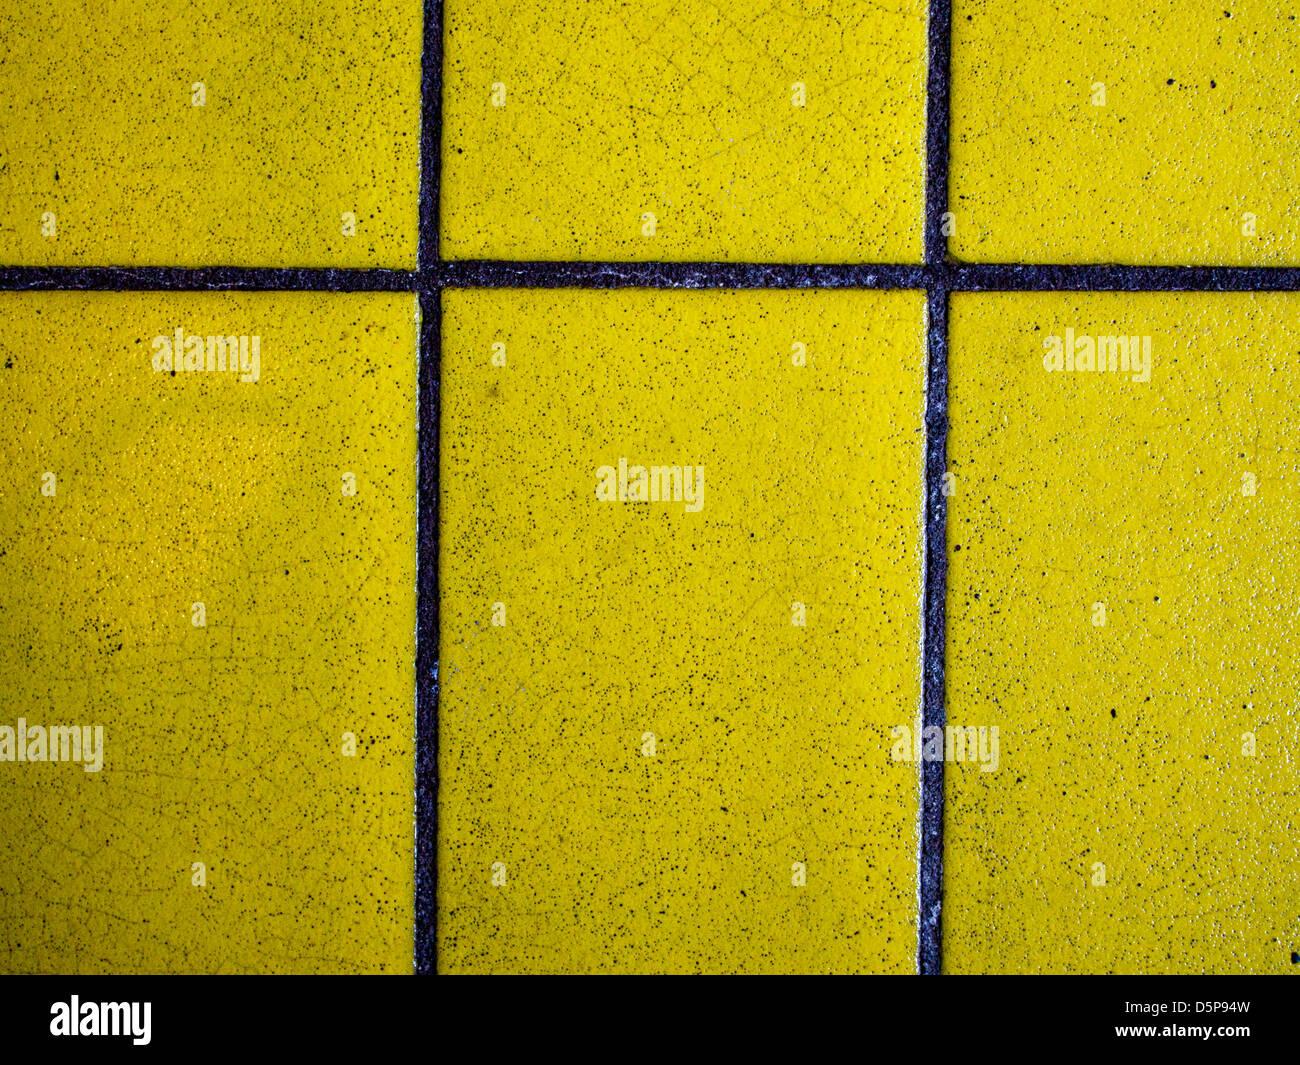 yellow vintage tile - Stock Image